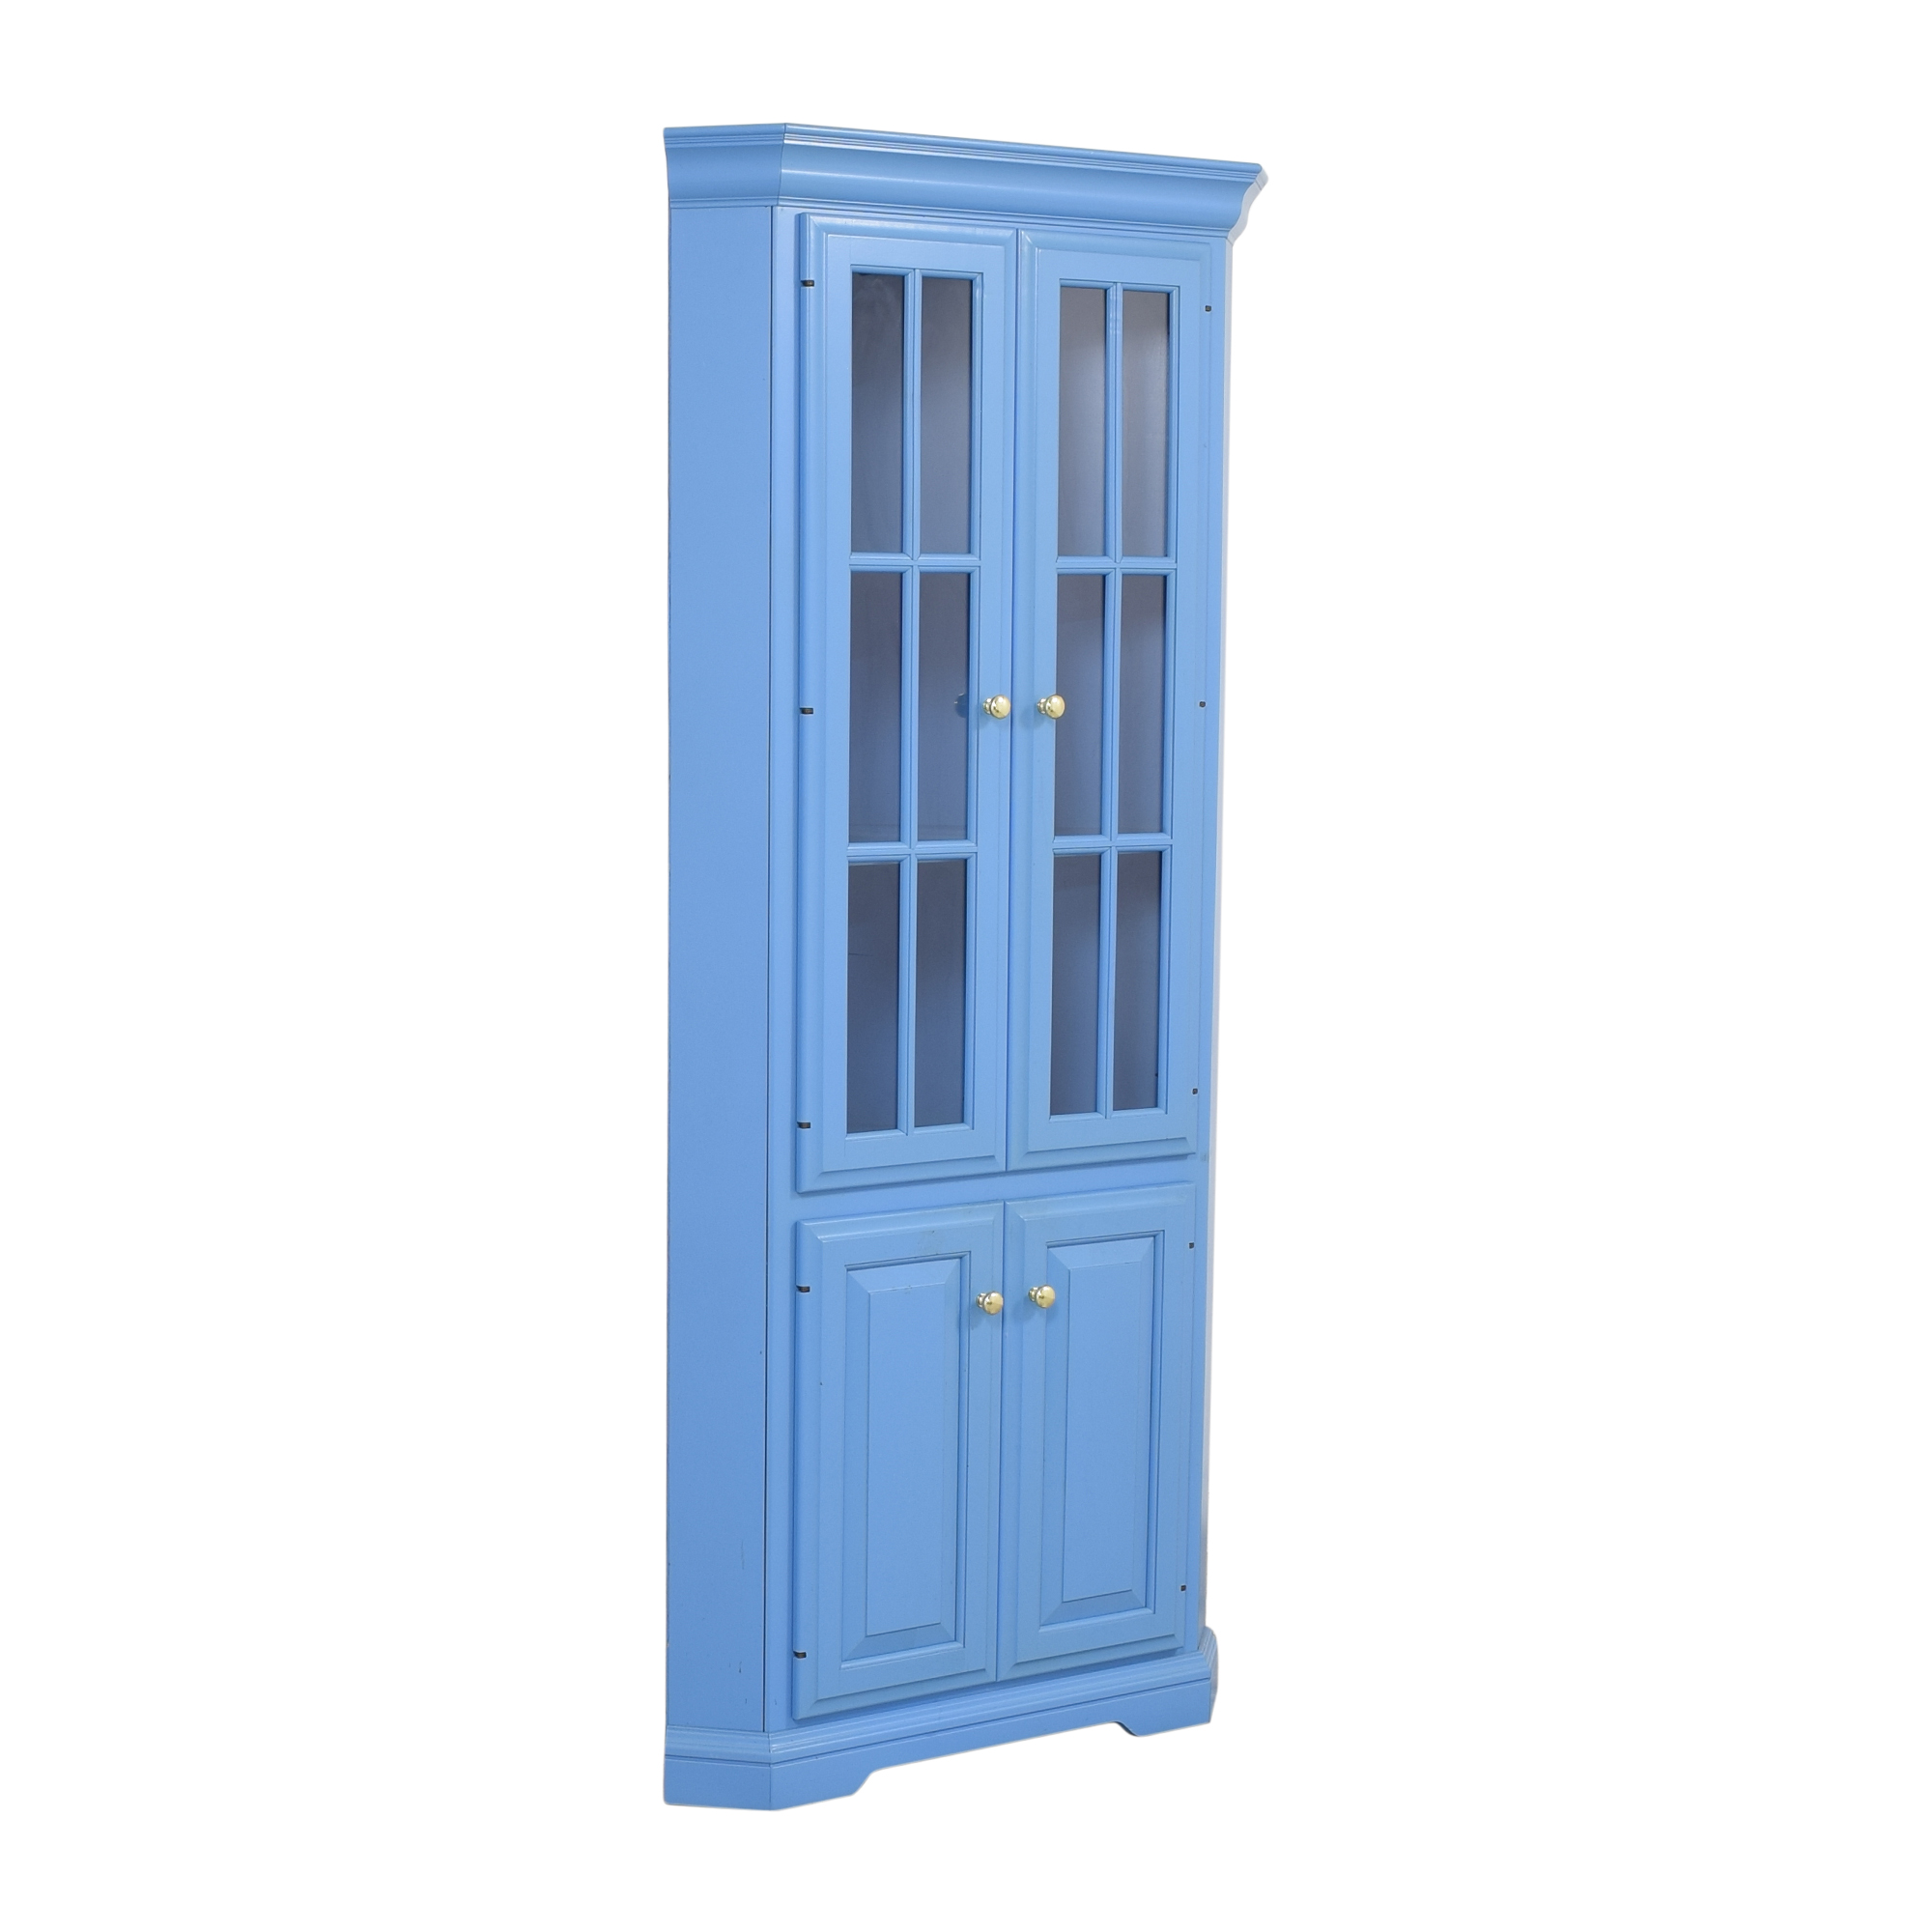 Woodcraft Woodcraft Corner China Cabinet Cabinets & Sideboards